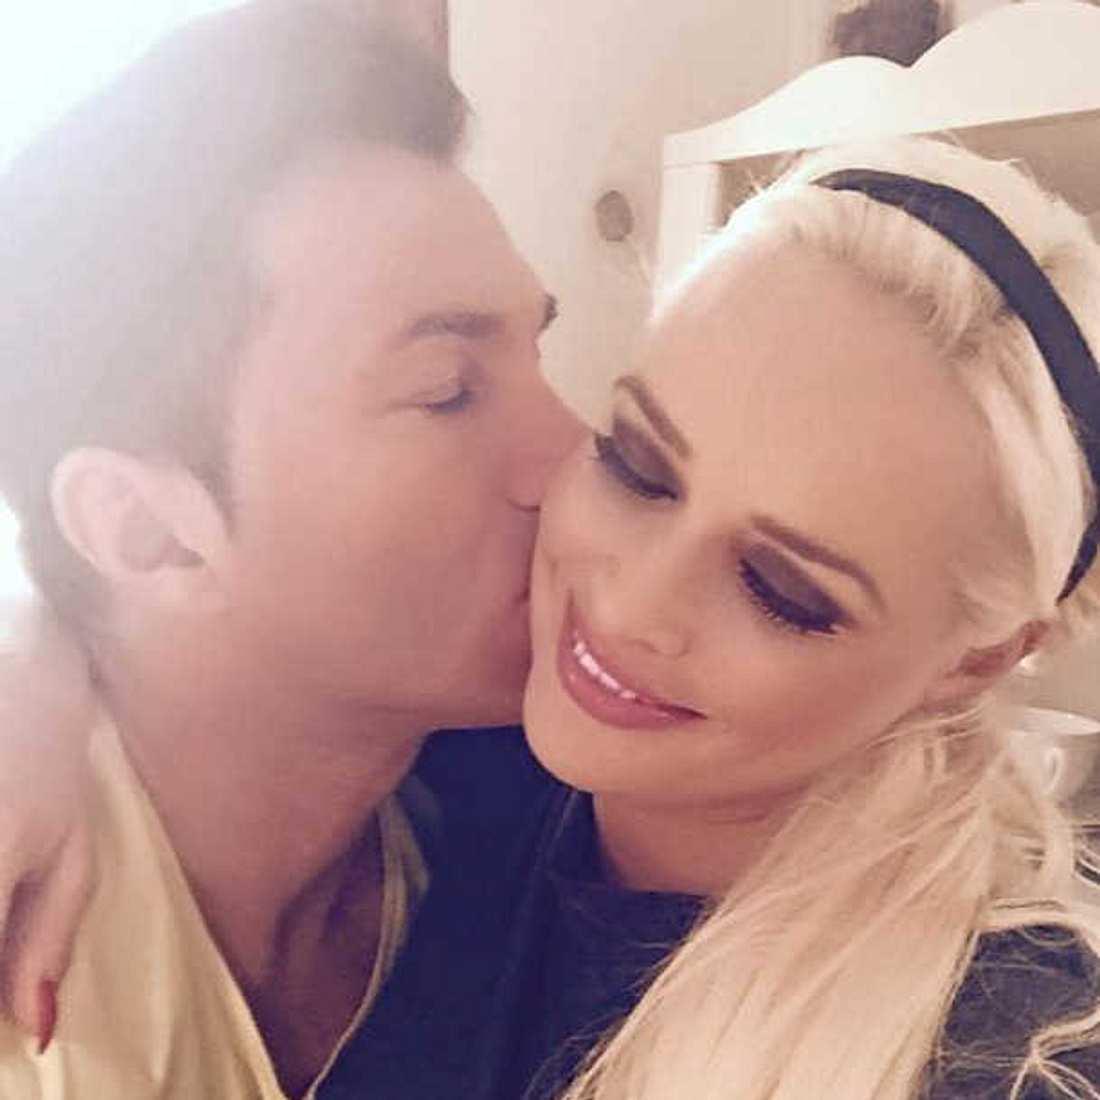 Daniela Katzenberger und Lucas Cordalis wollen im TV heiraten